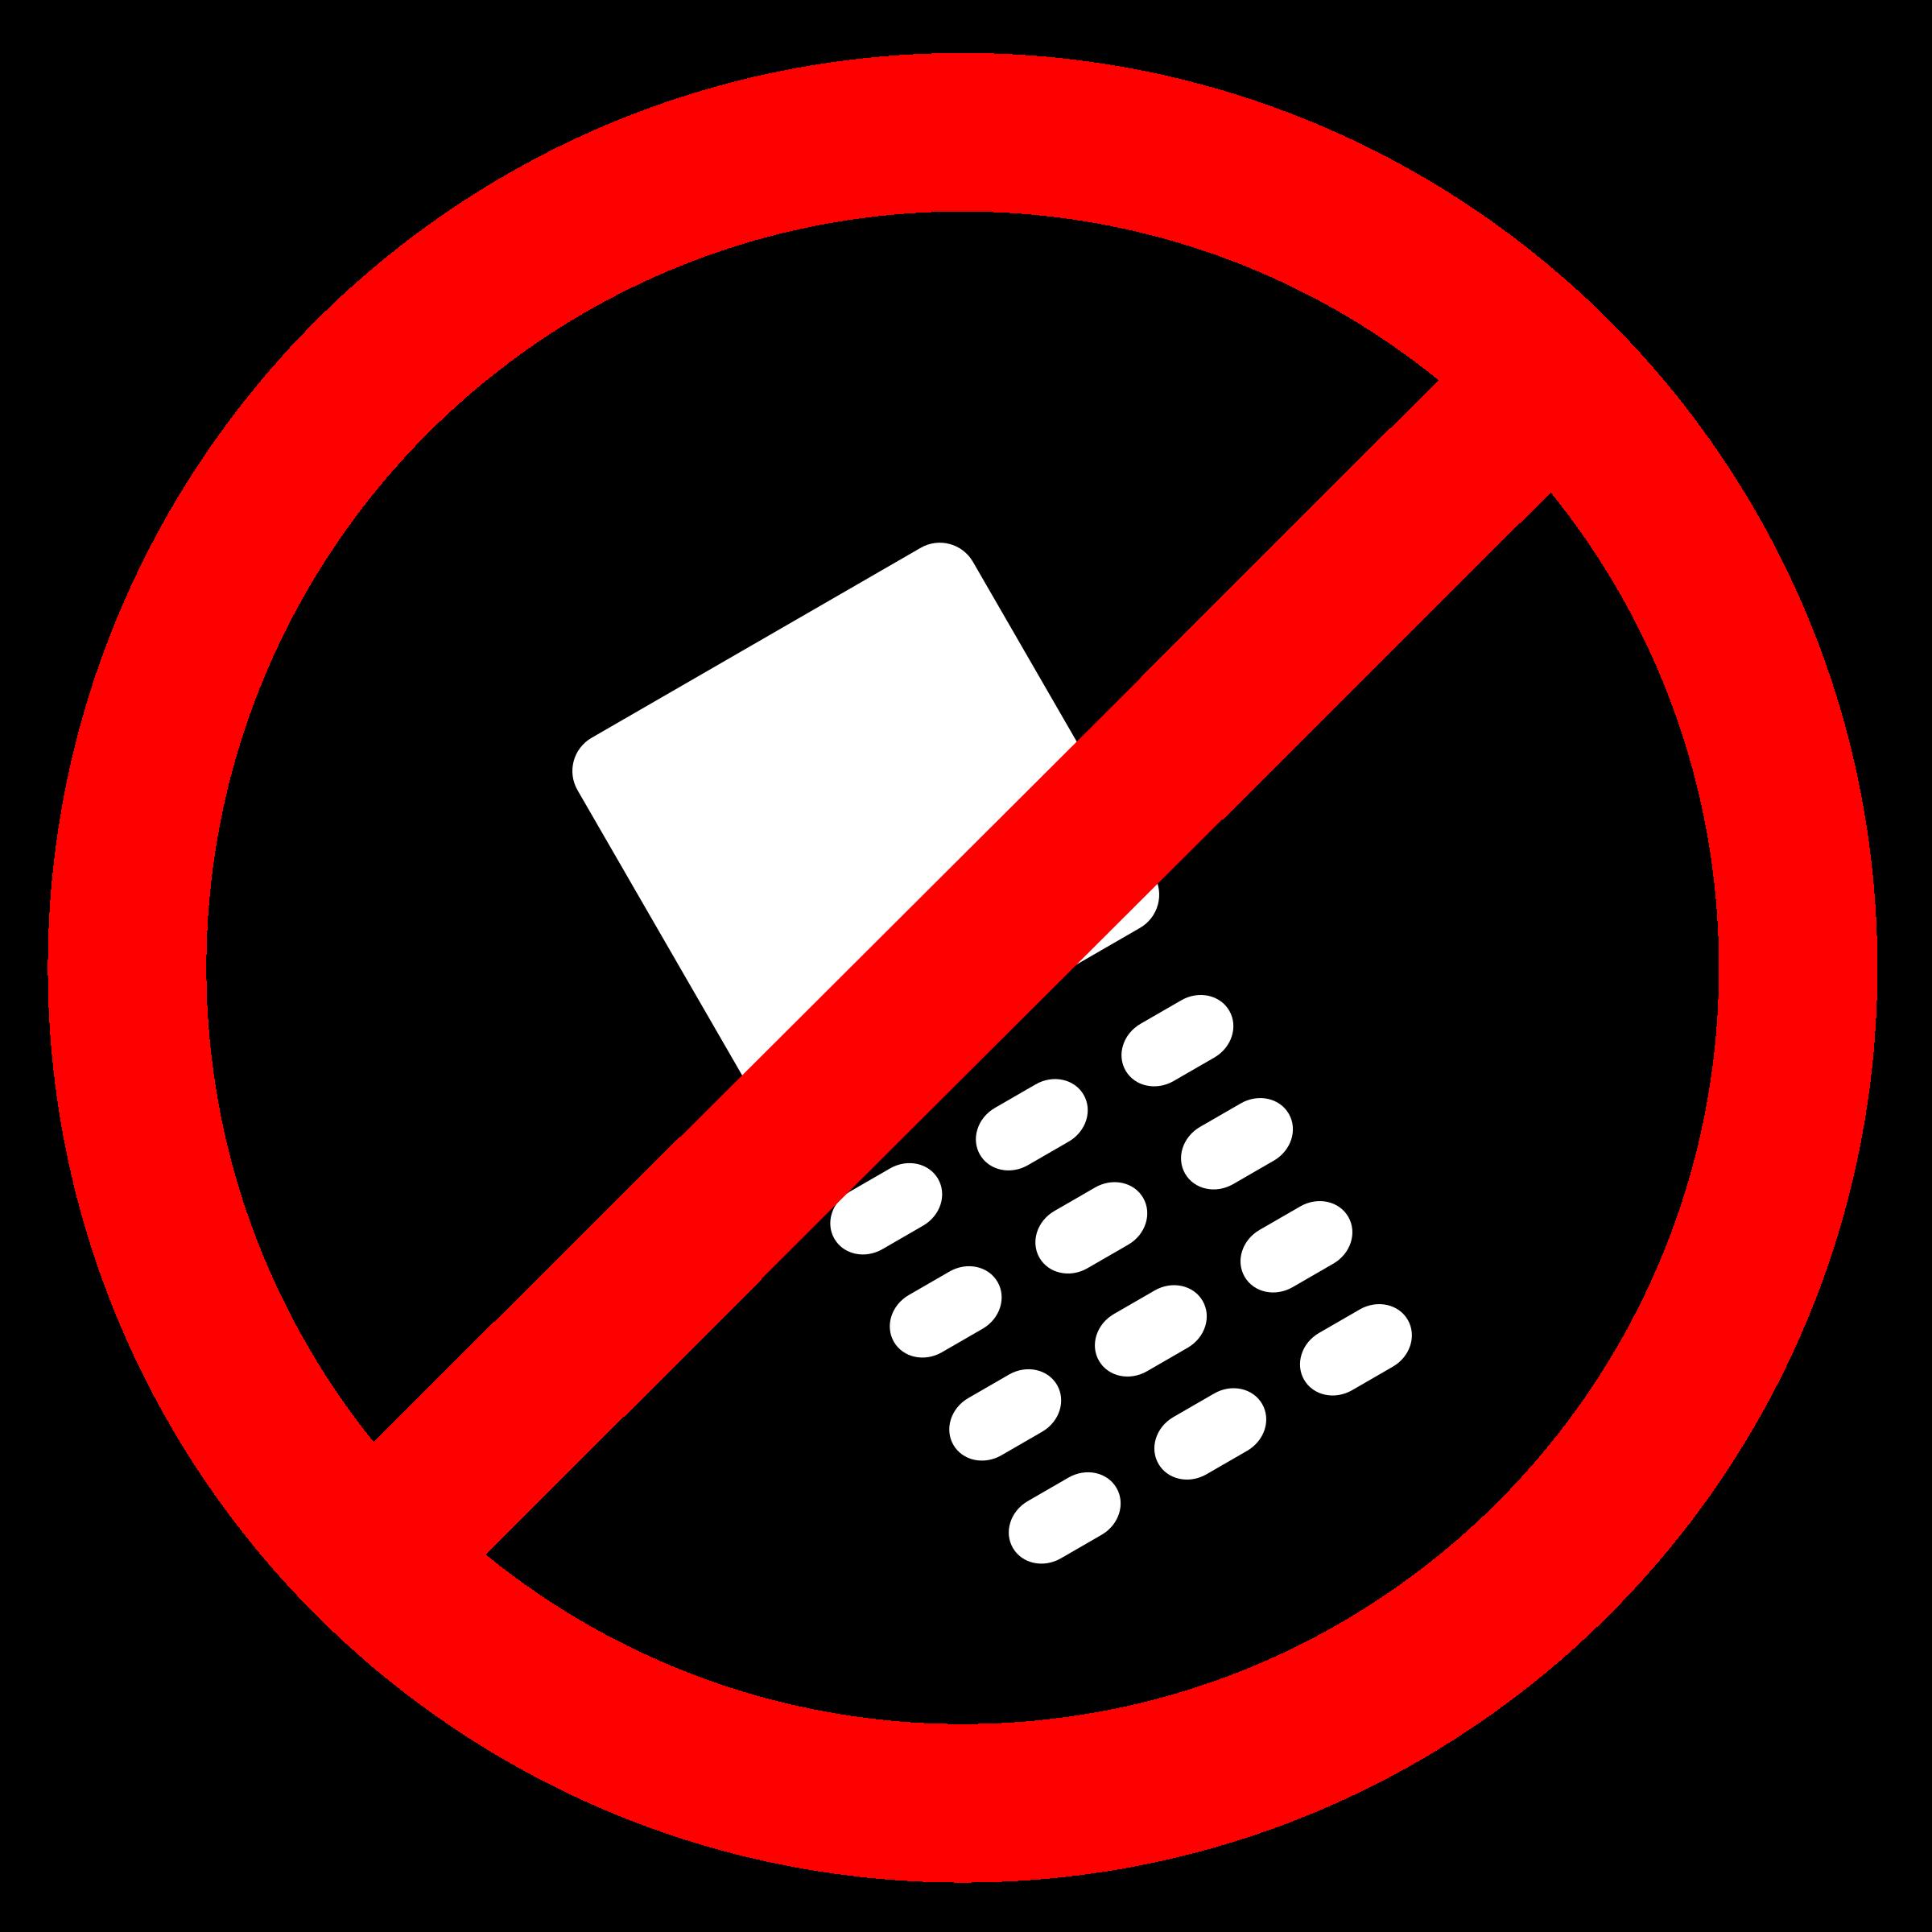 Phone clipart mbile #7